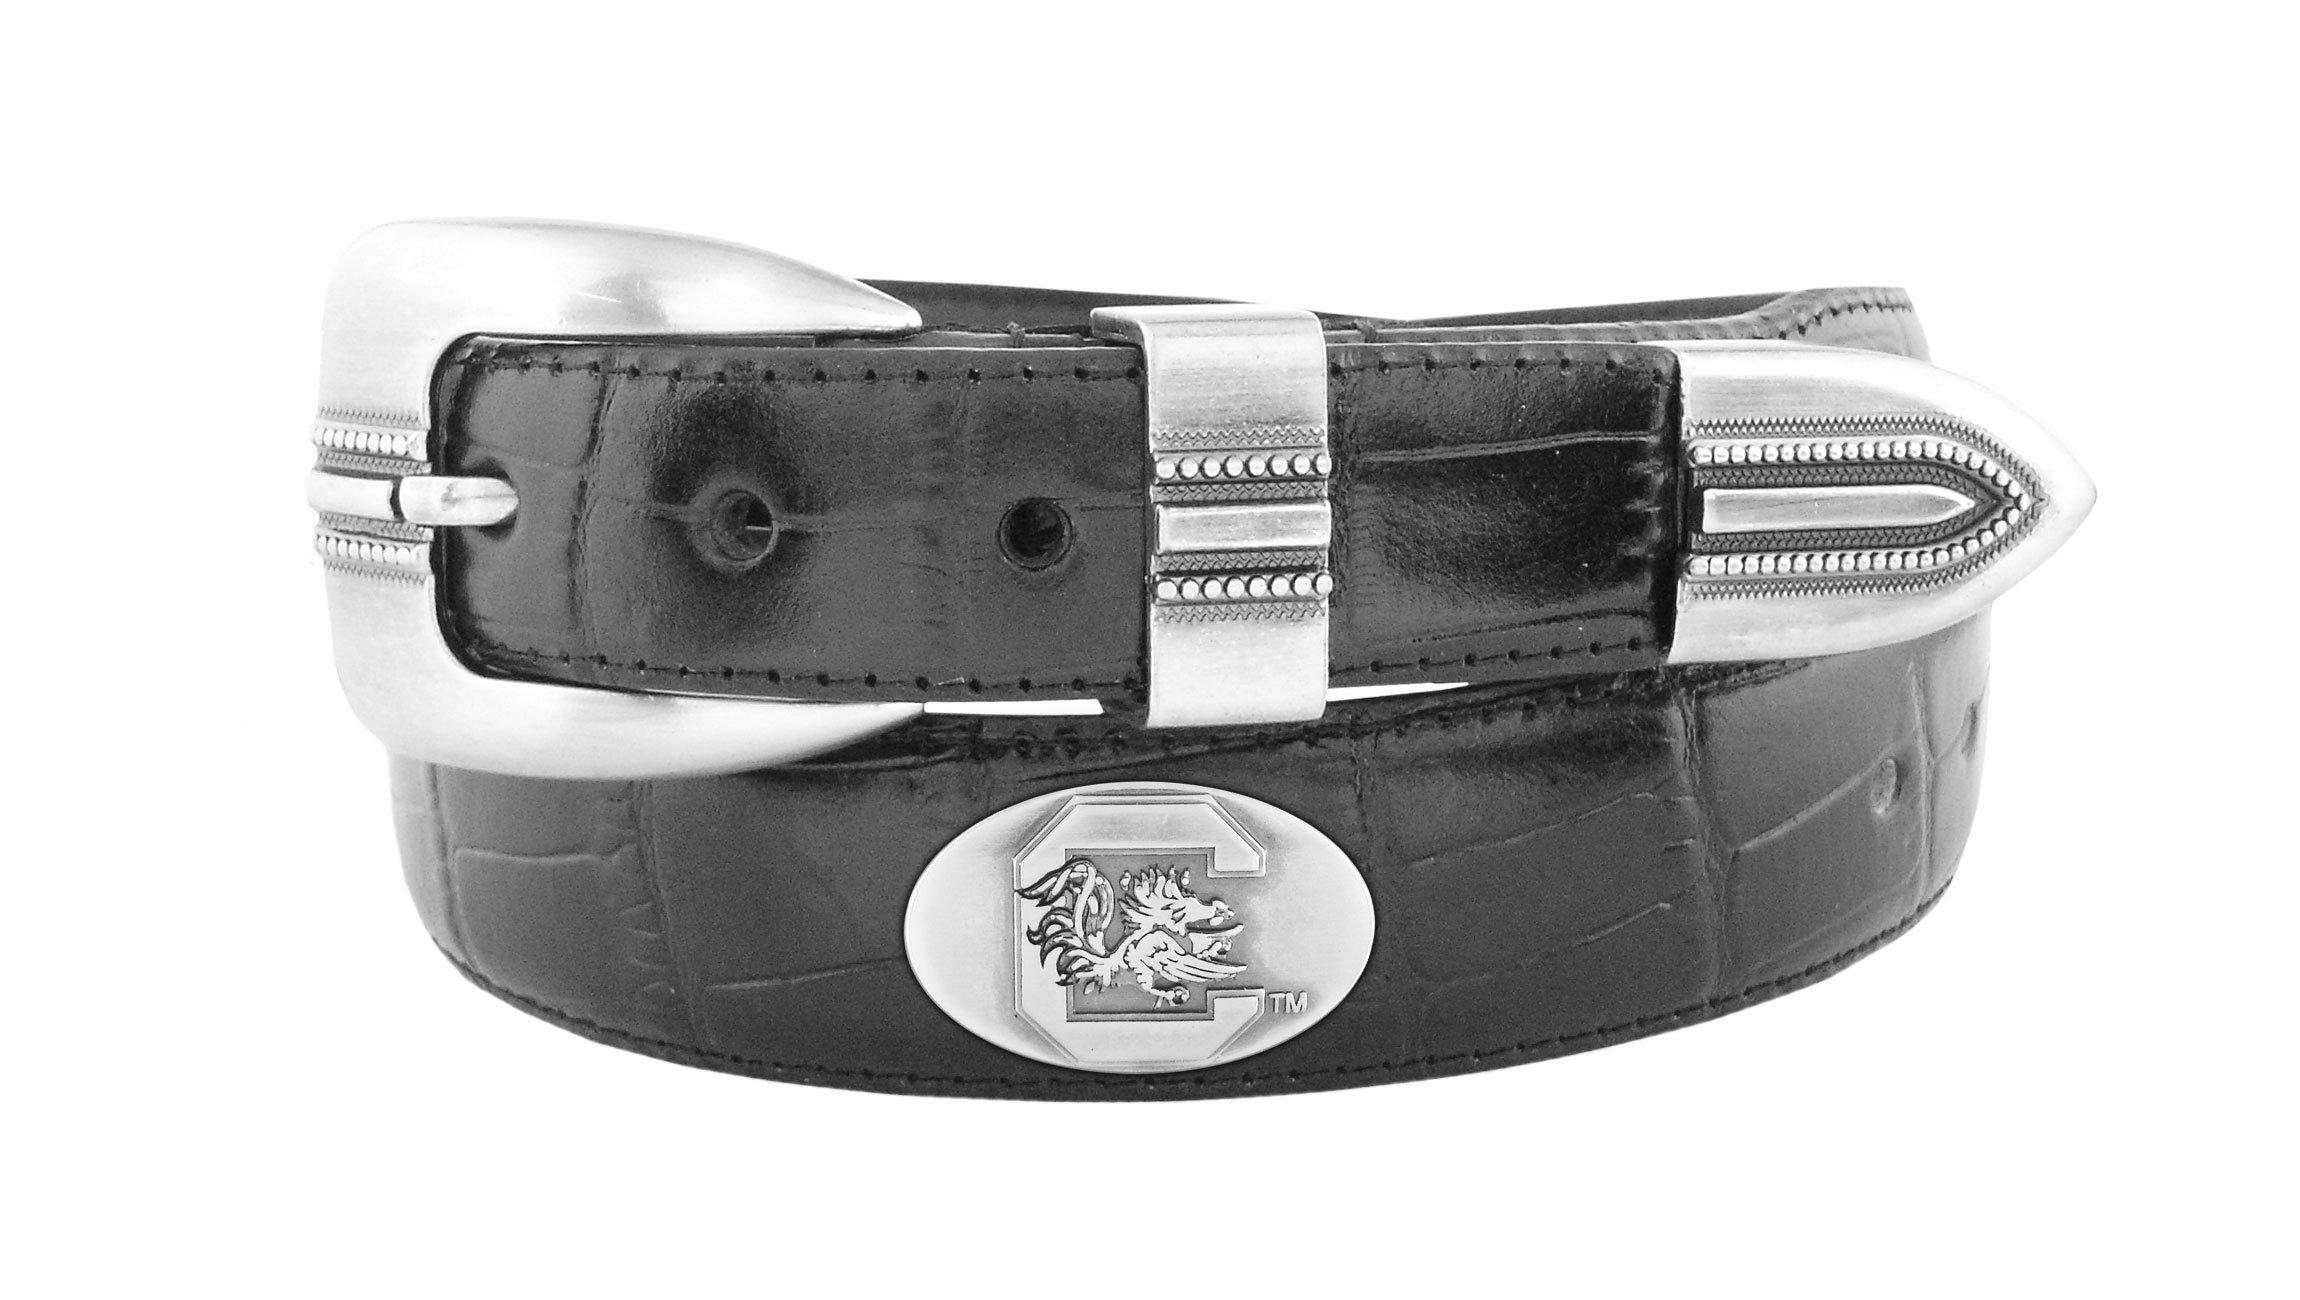 NCAA North Carolina State Wolfpack Croc Leather Webbing Concho Belt